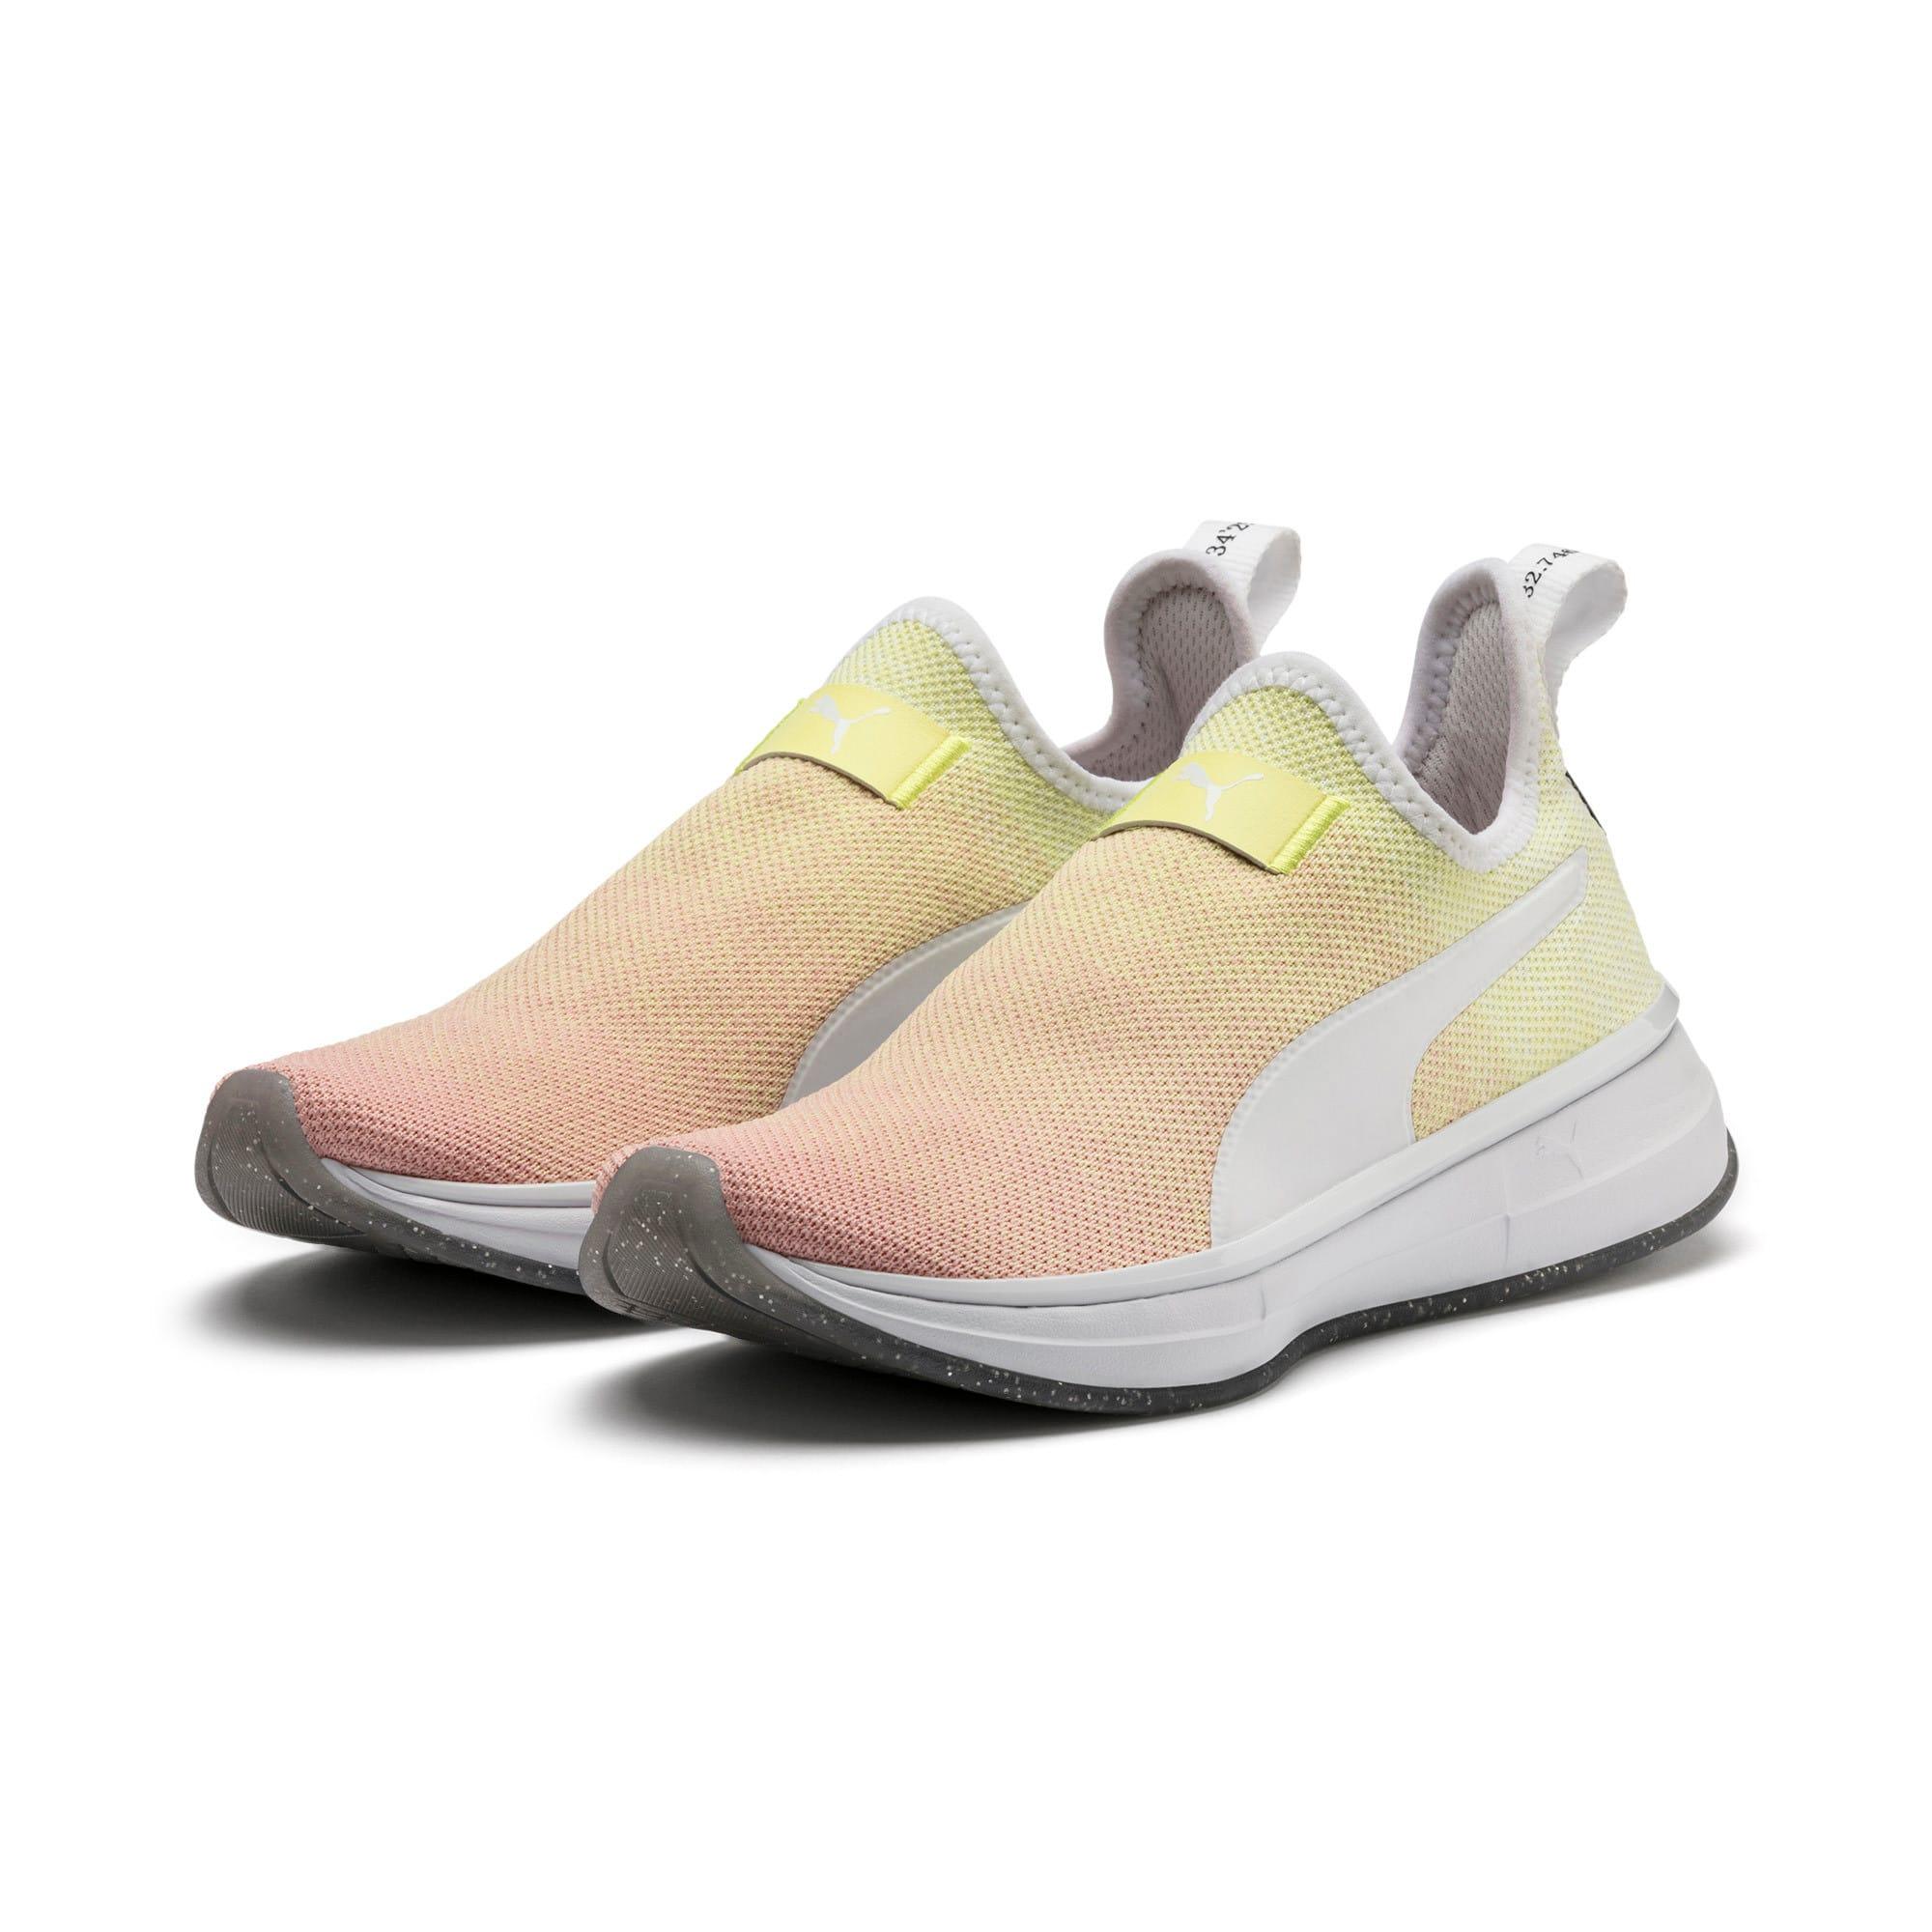 Thumbnail 3 of SG Slip-On Sunrise Women's Training Shoes, YELLOW-Peach Bud-White, medium